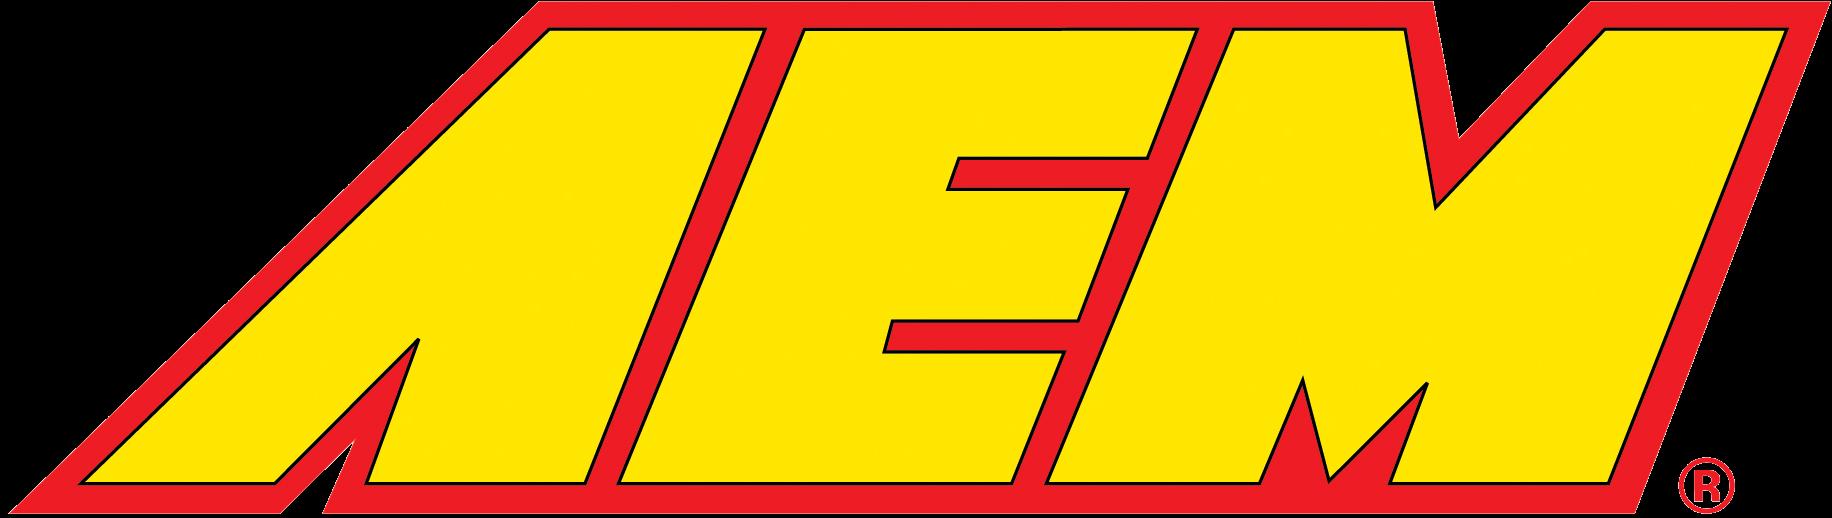 AEM-logo.png - Aem Logo PNG